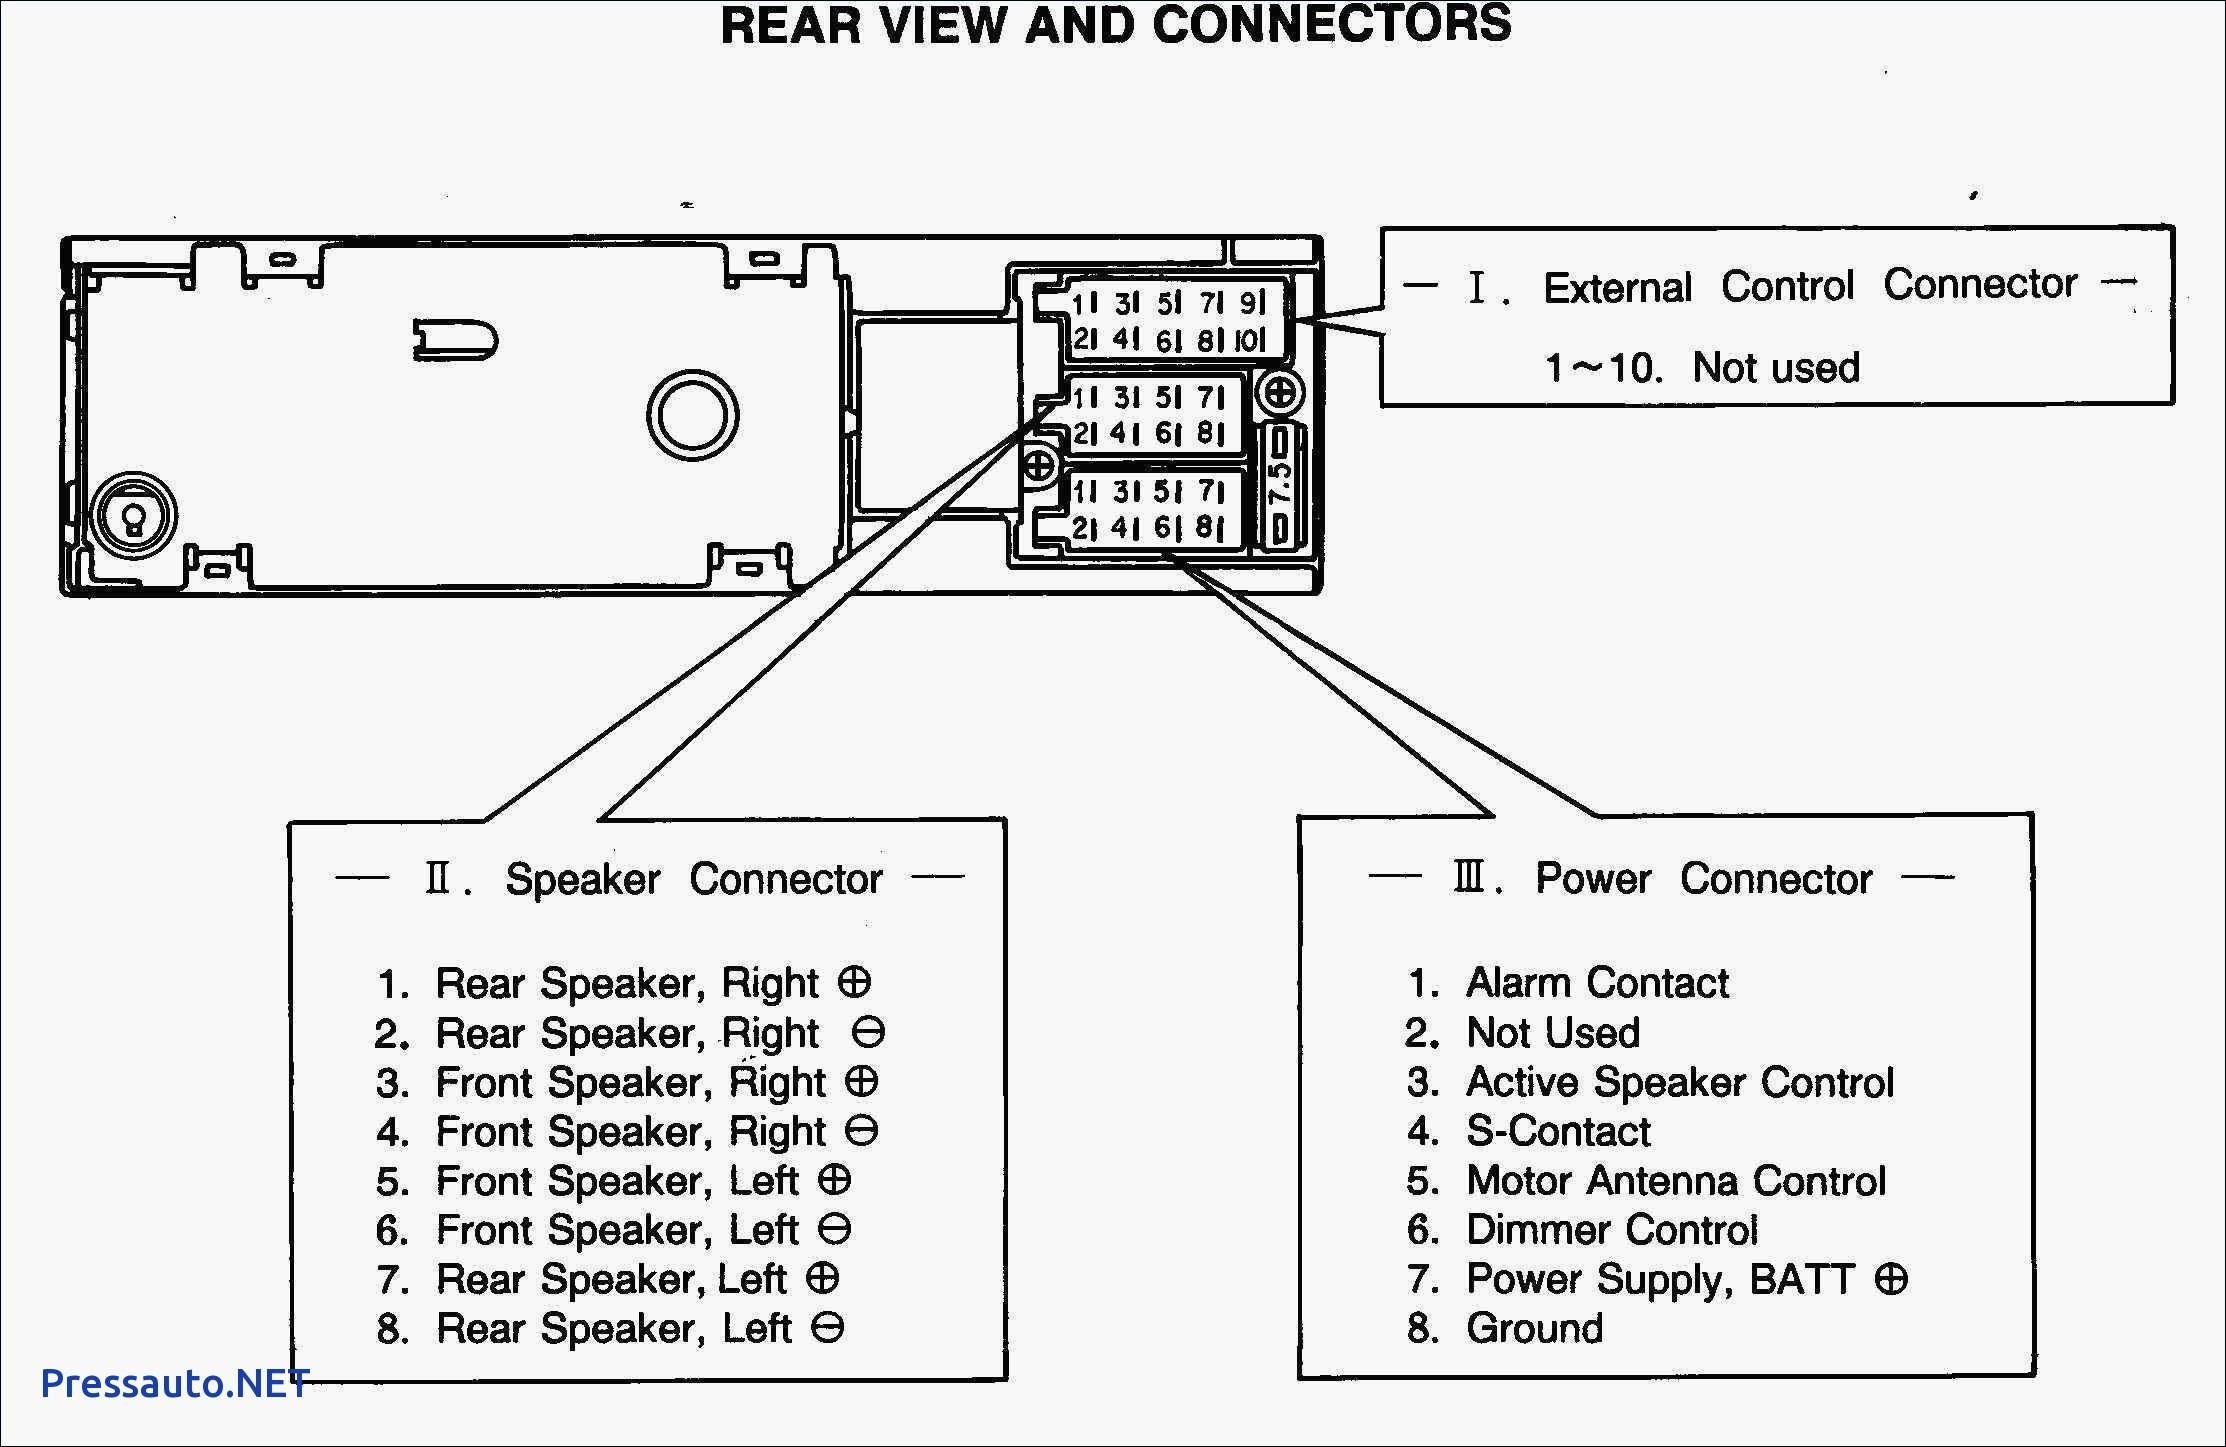 2003 Vw Jetta Engine Diagram Vw Jetta Wiring Diagram Wiring Diagram